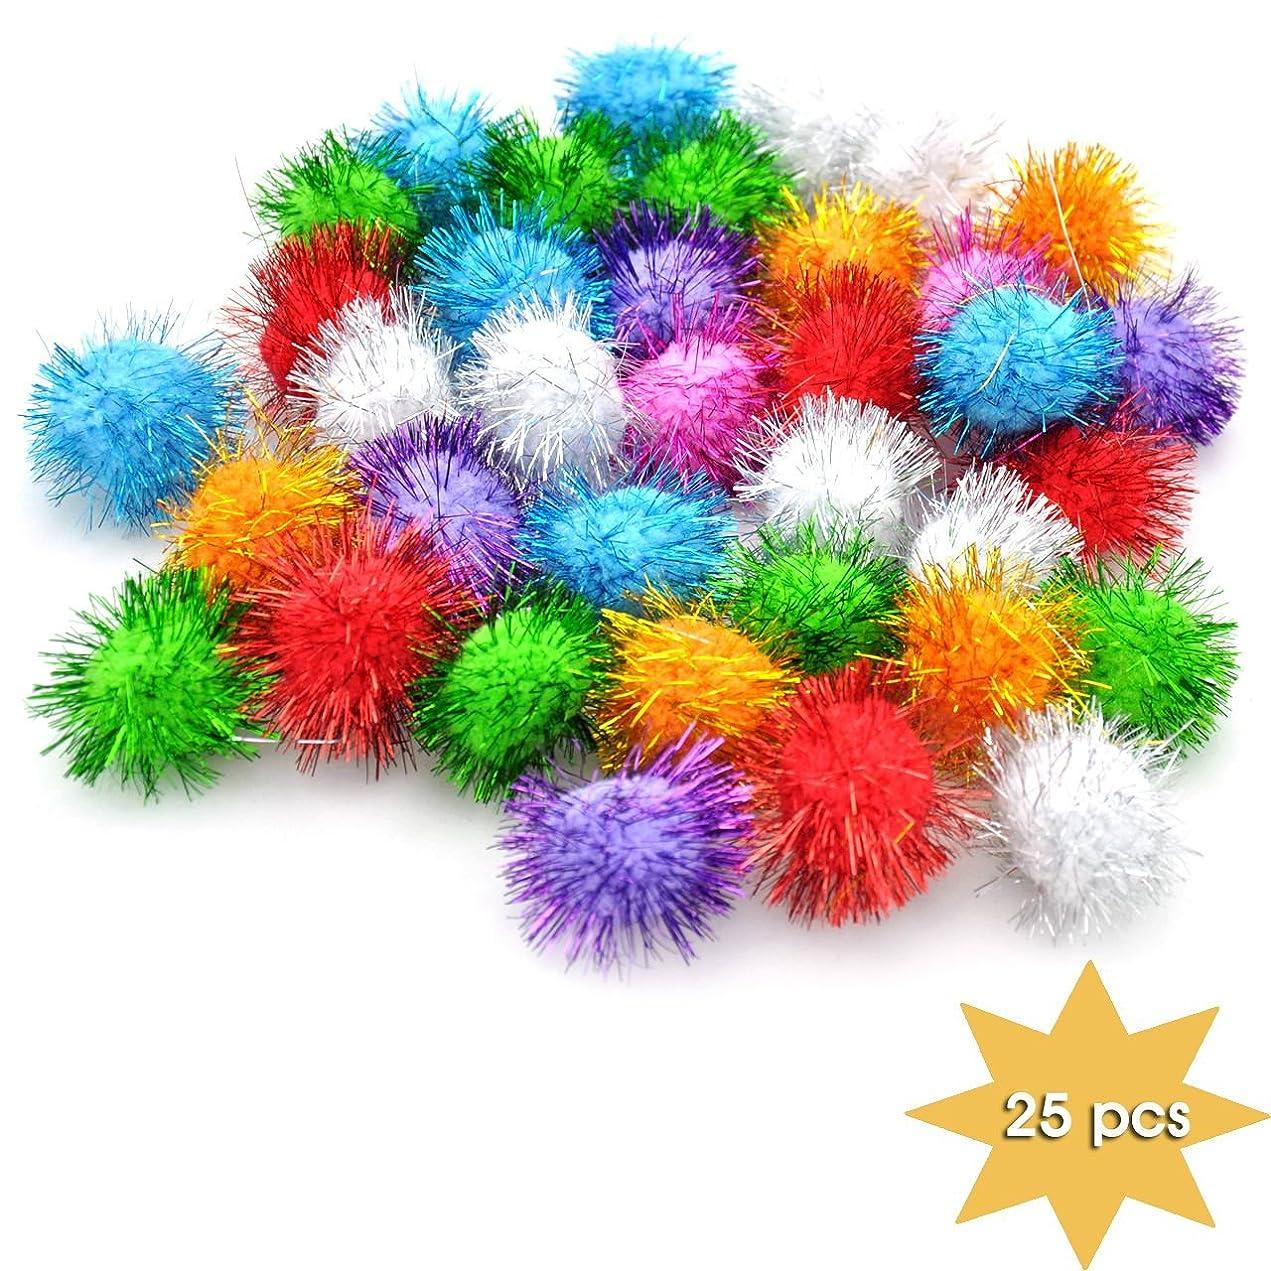 Yazy Craft Sparkle Balls 25 pcs